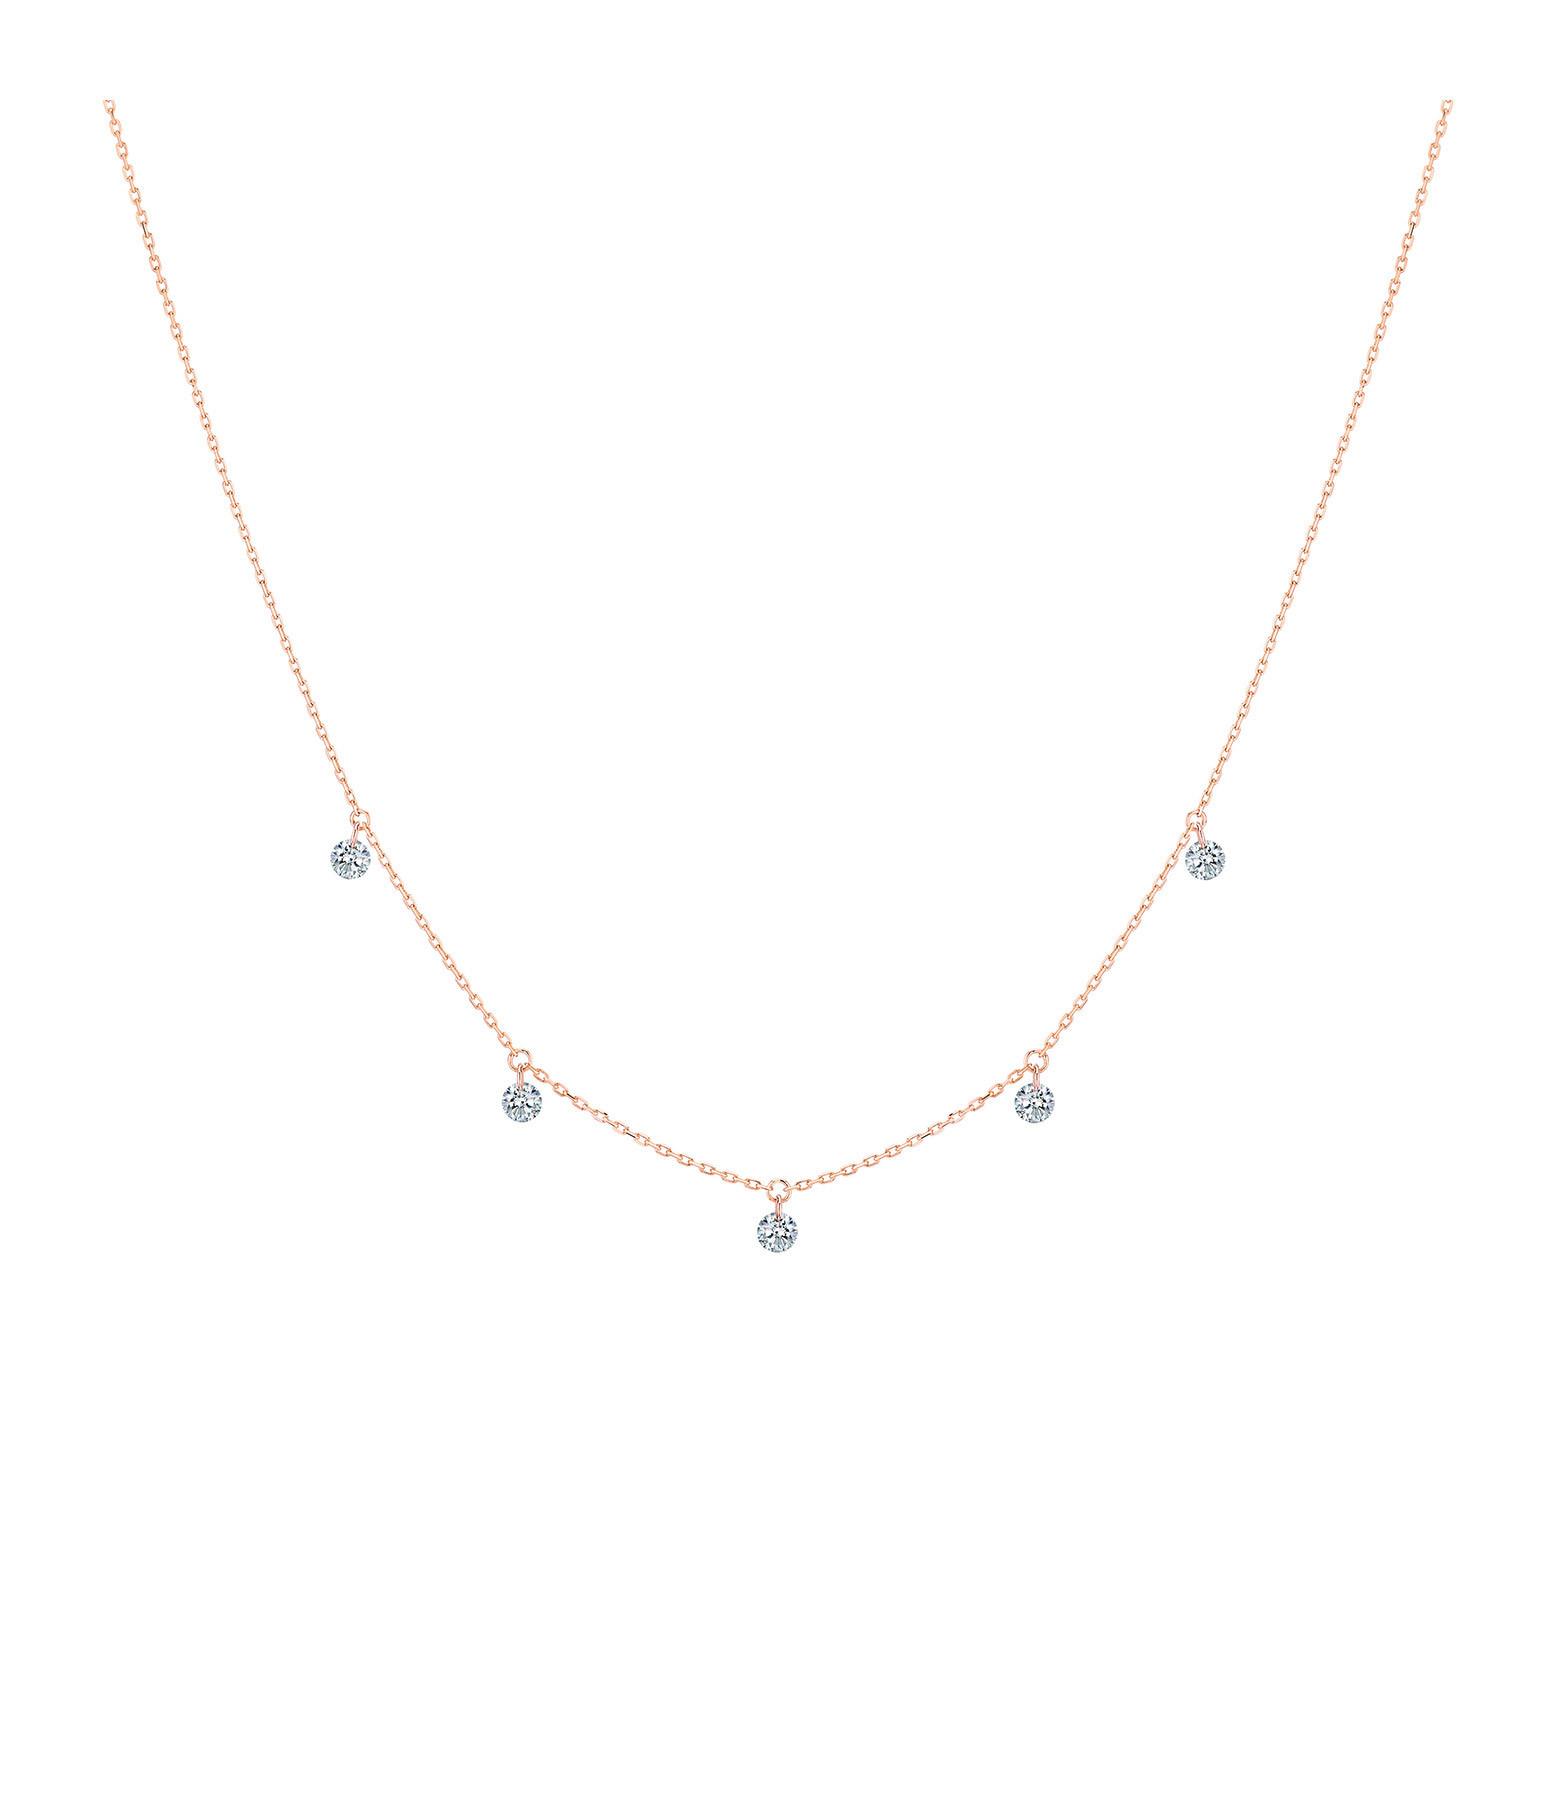 LA BRUNE & LA BLONDE - Collier 360° 5 Diamants Brillants Or Rose